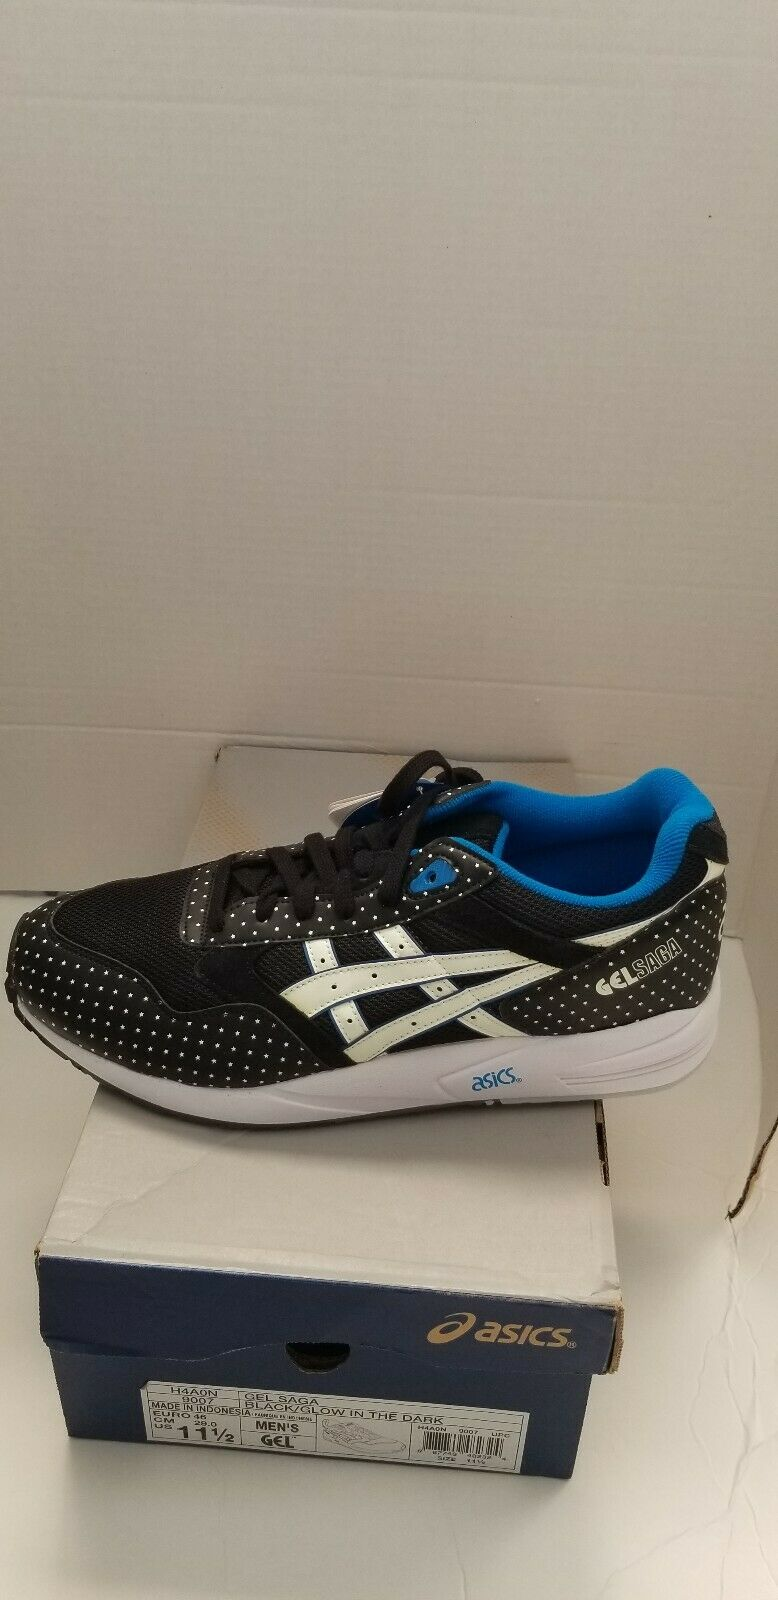 New in box, Men Asics Gel Saga Black Glow In The Dark shoes size 11.5 H4A0N